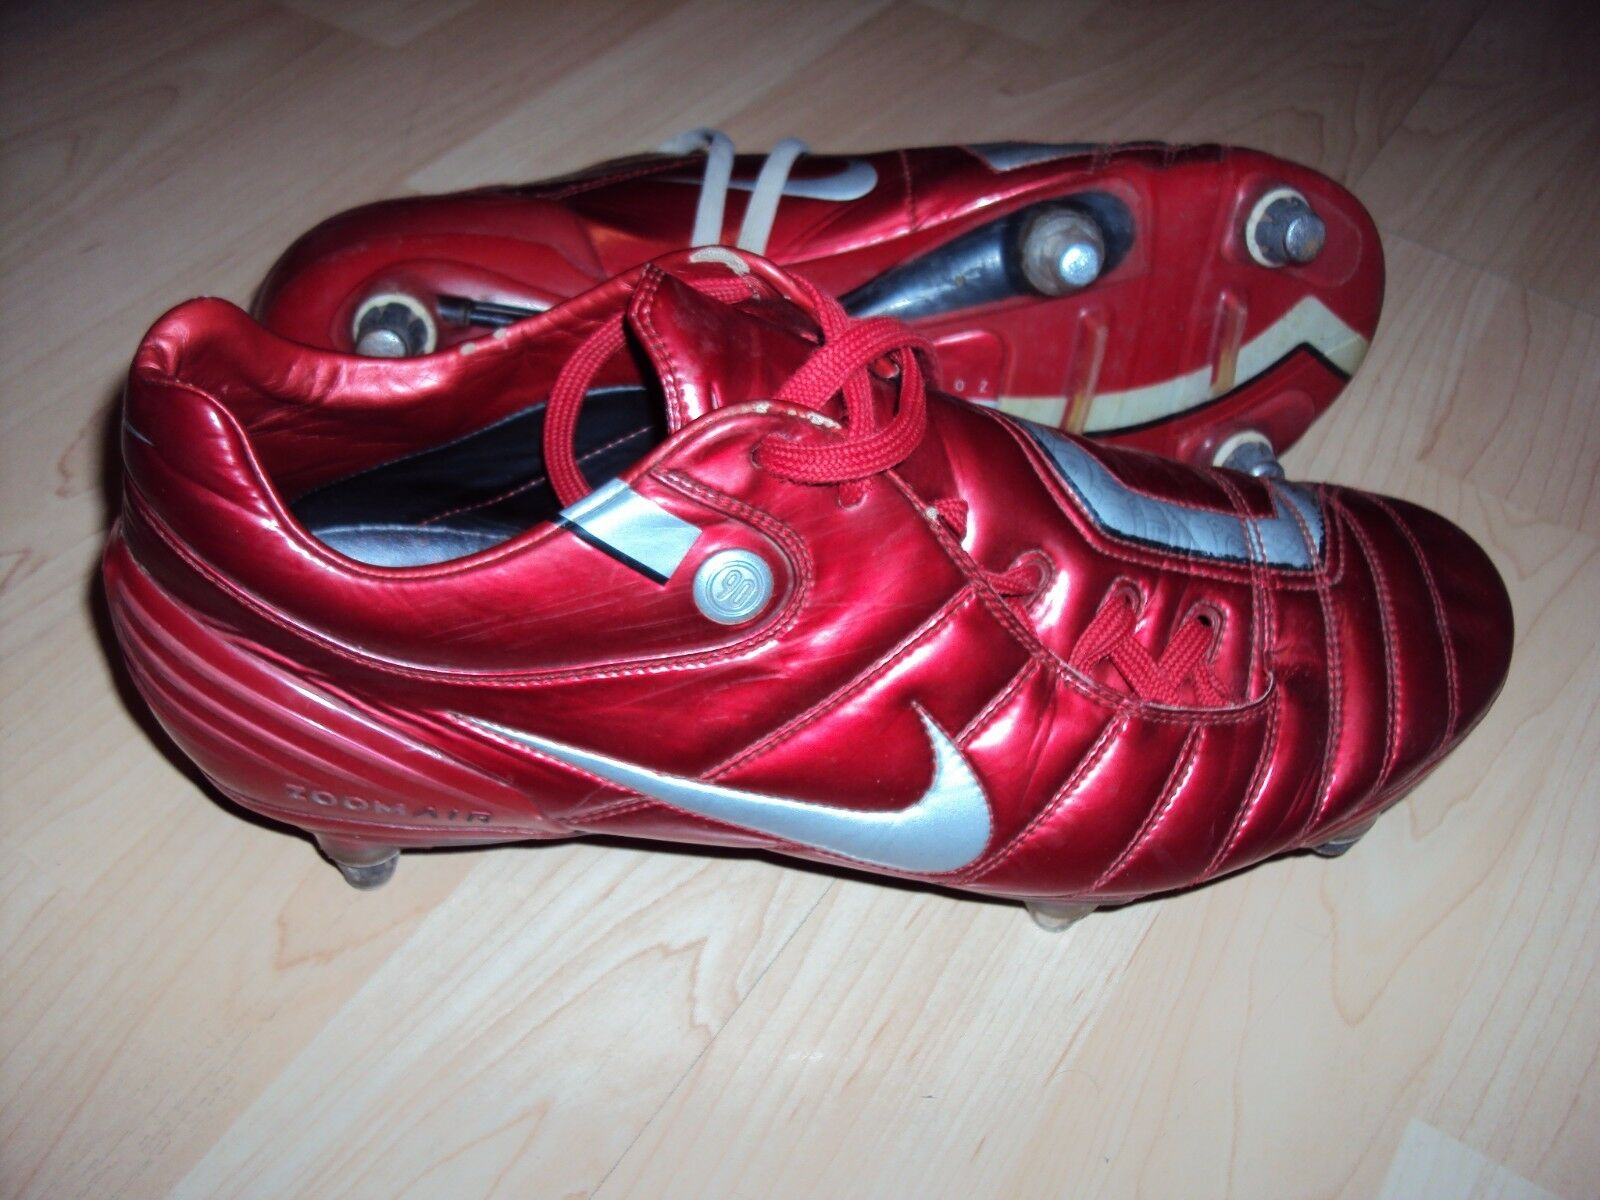 Nike Air Zoom Total 90 supremacía Rojo SG US1110 EUR 45 CM29